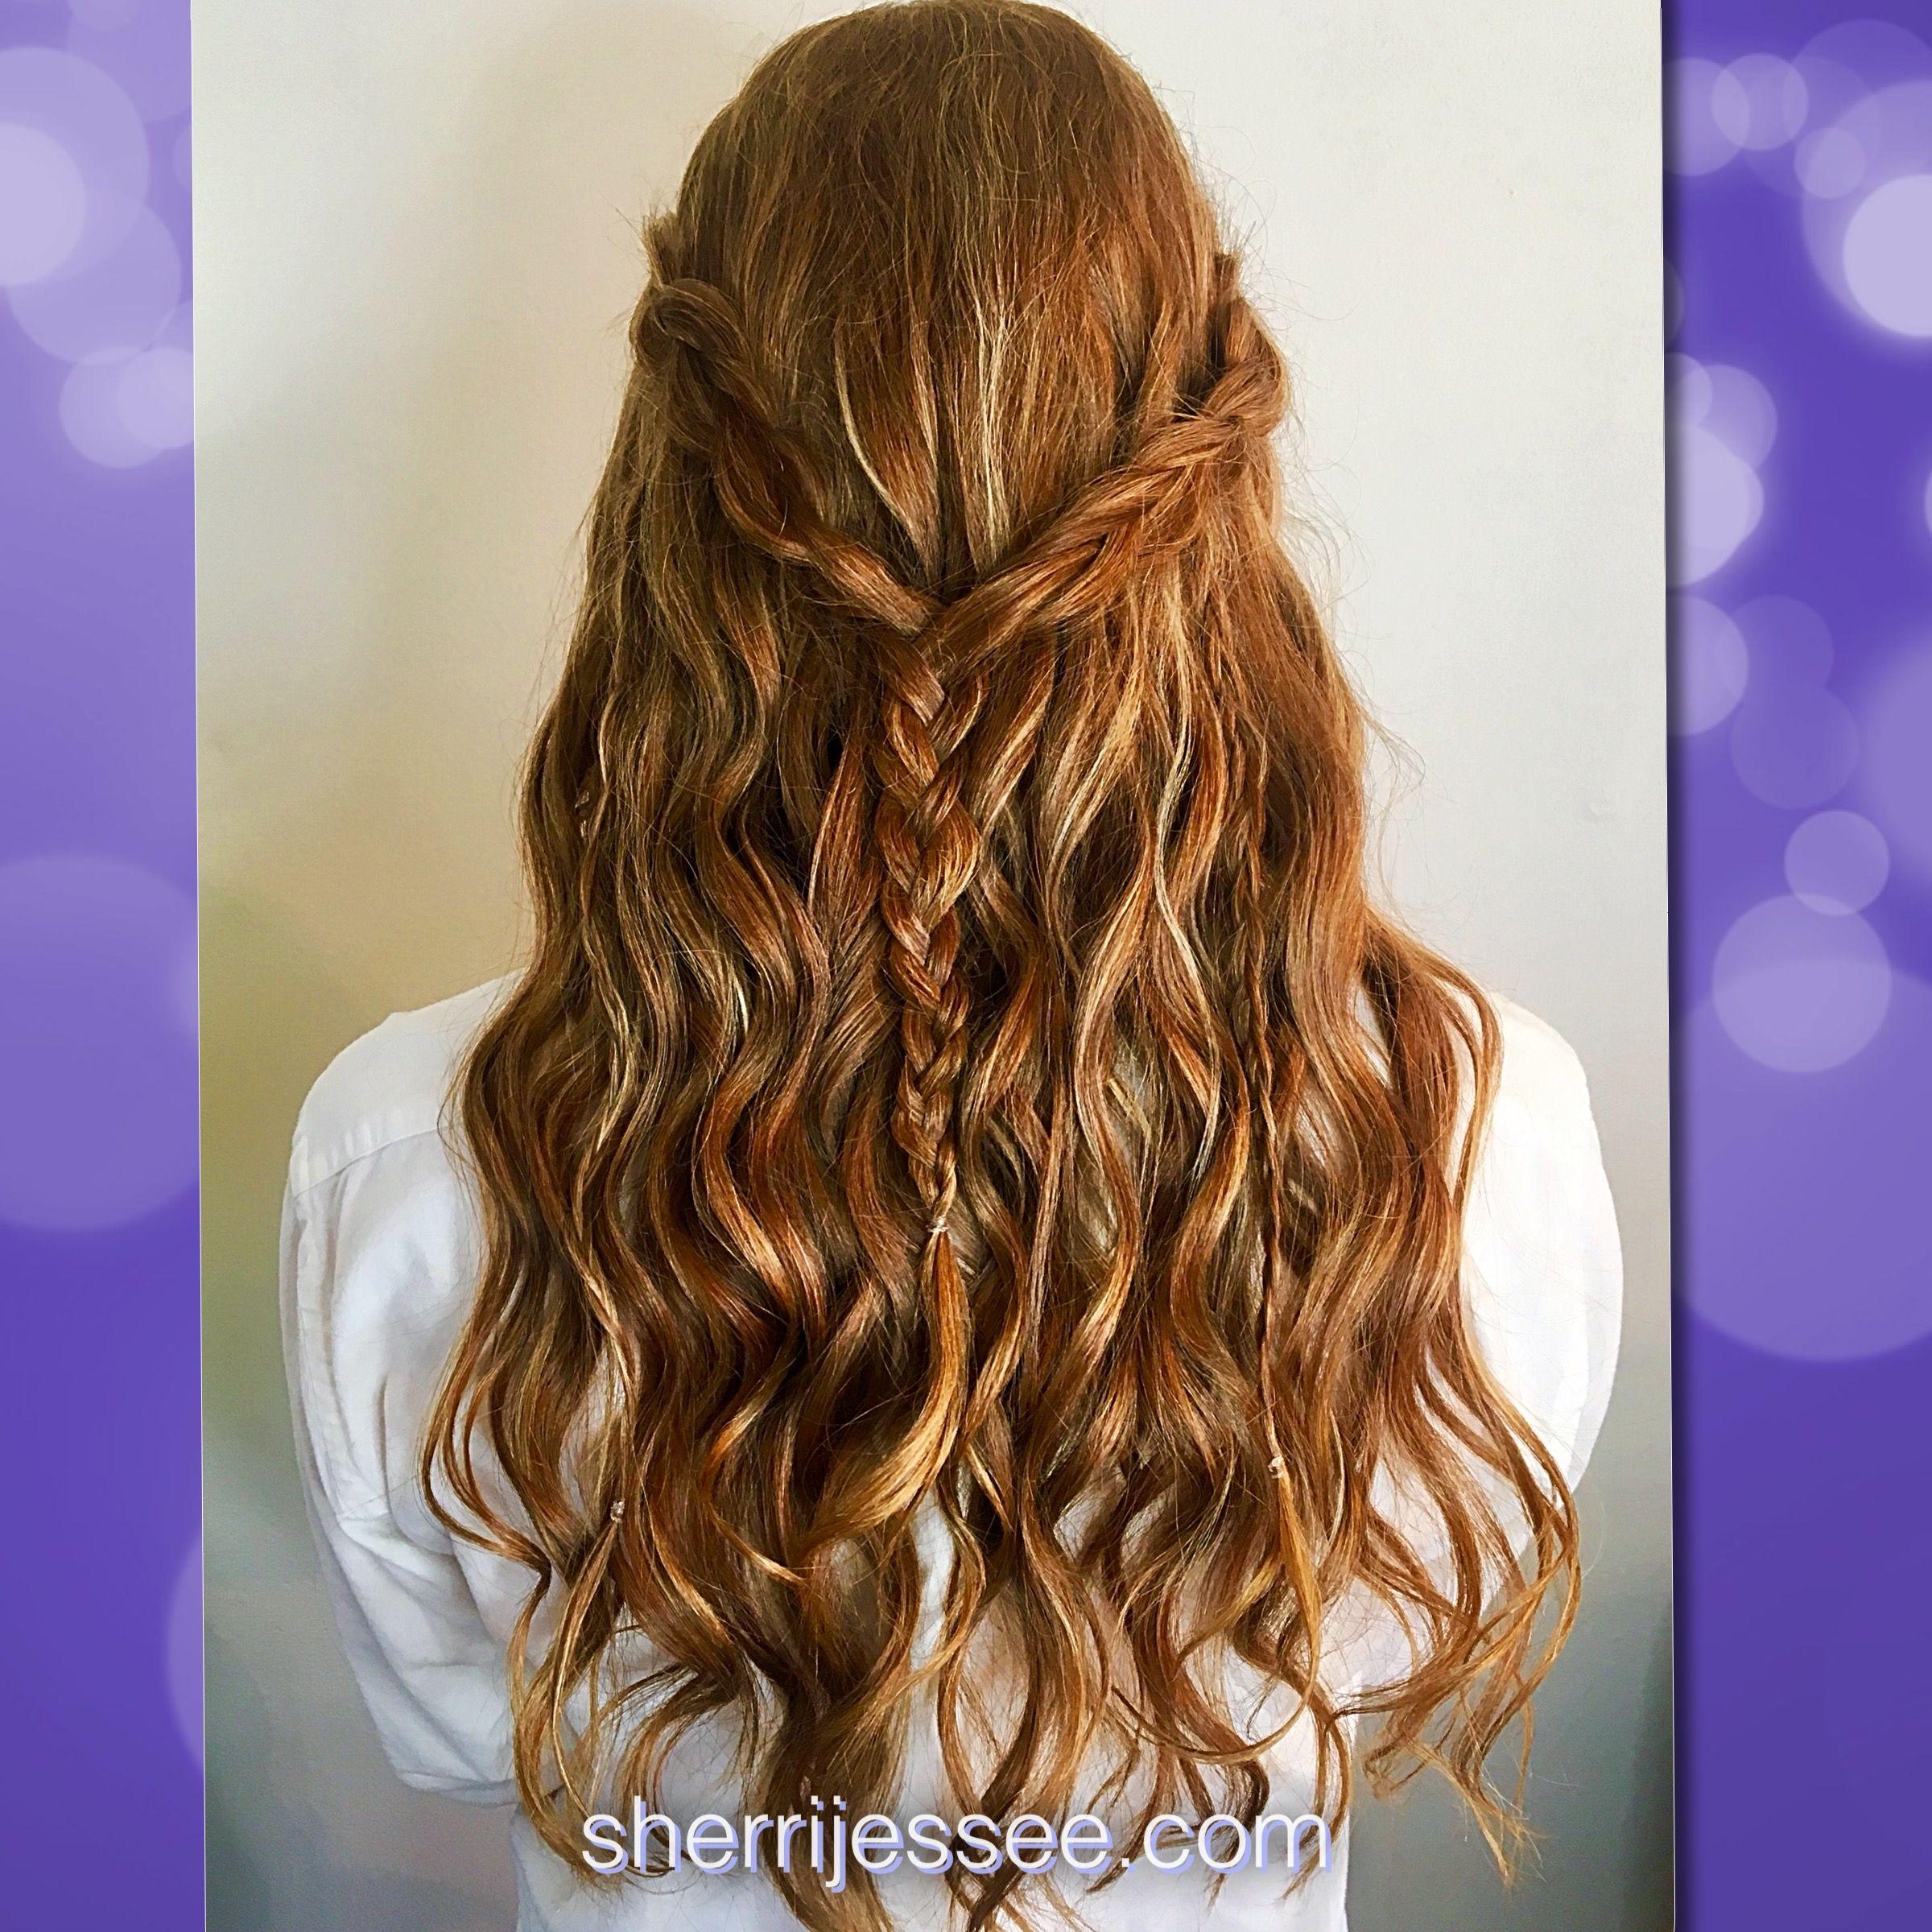 promhair #prom #halfup #curls #braids #bohemian